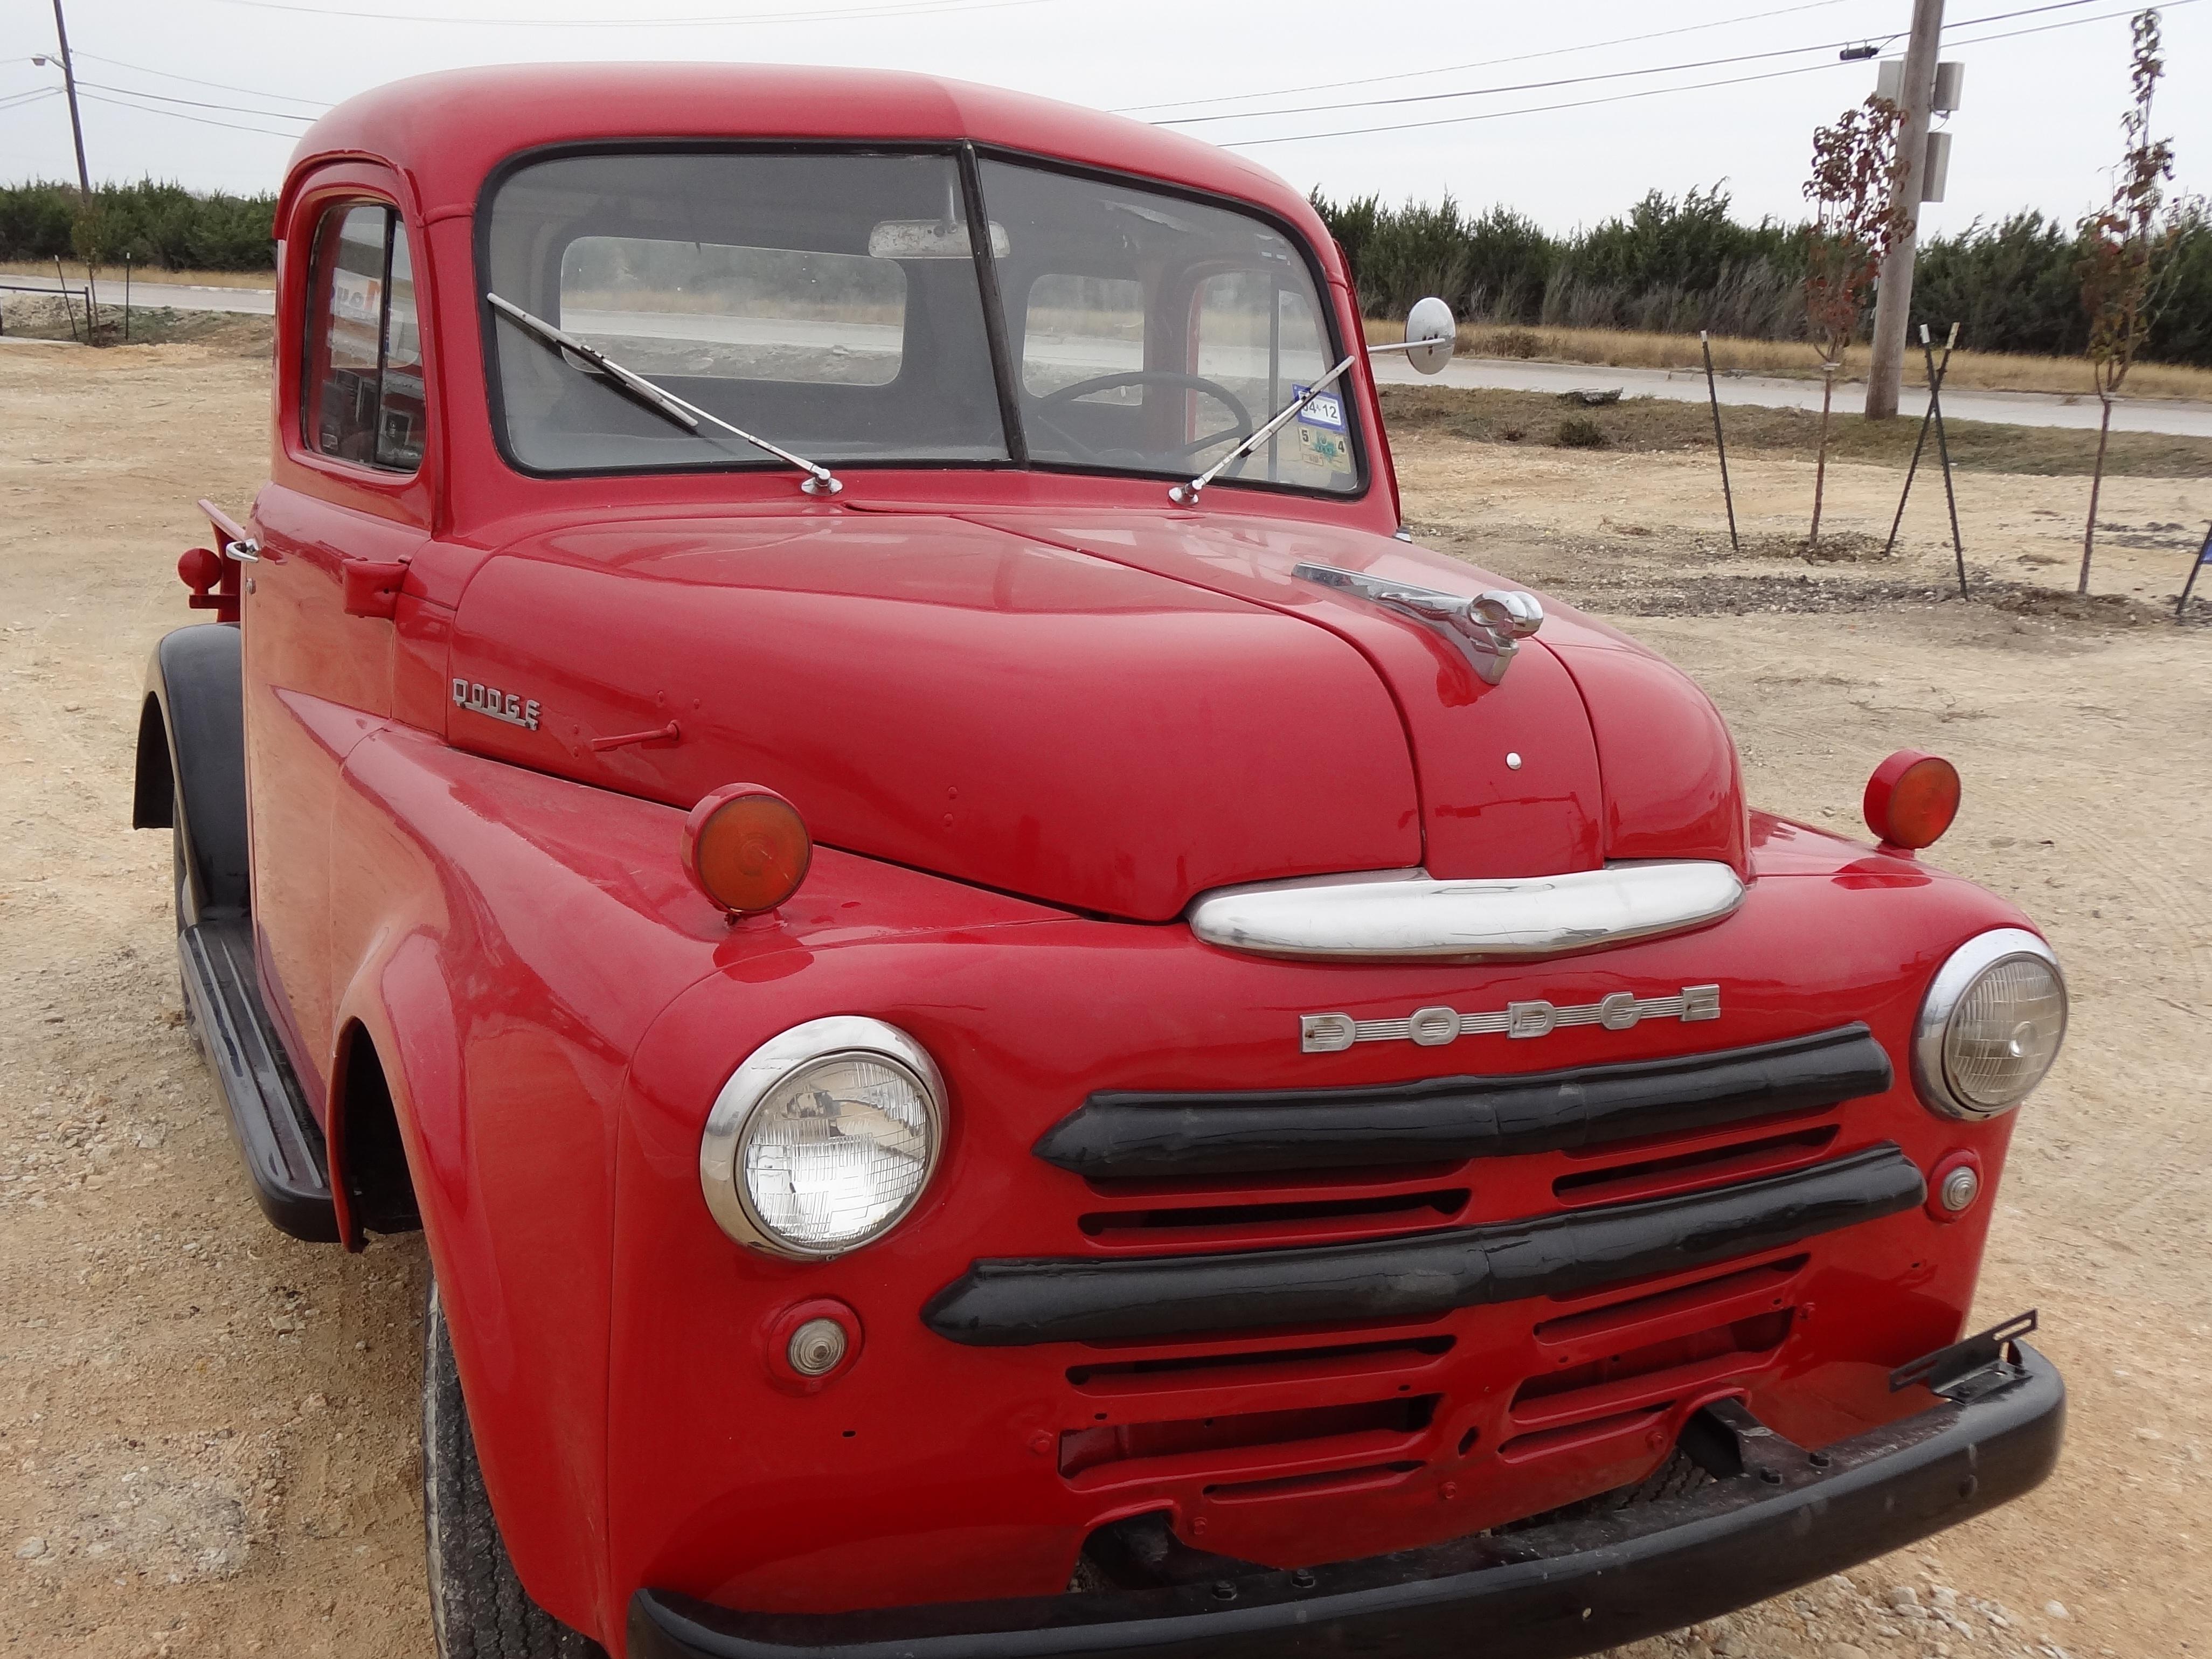 1949 dodge truck wallpaper - photo #2